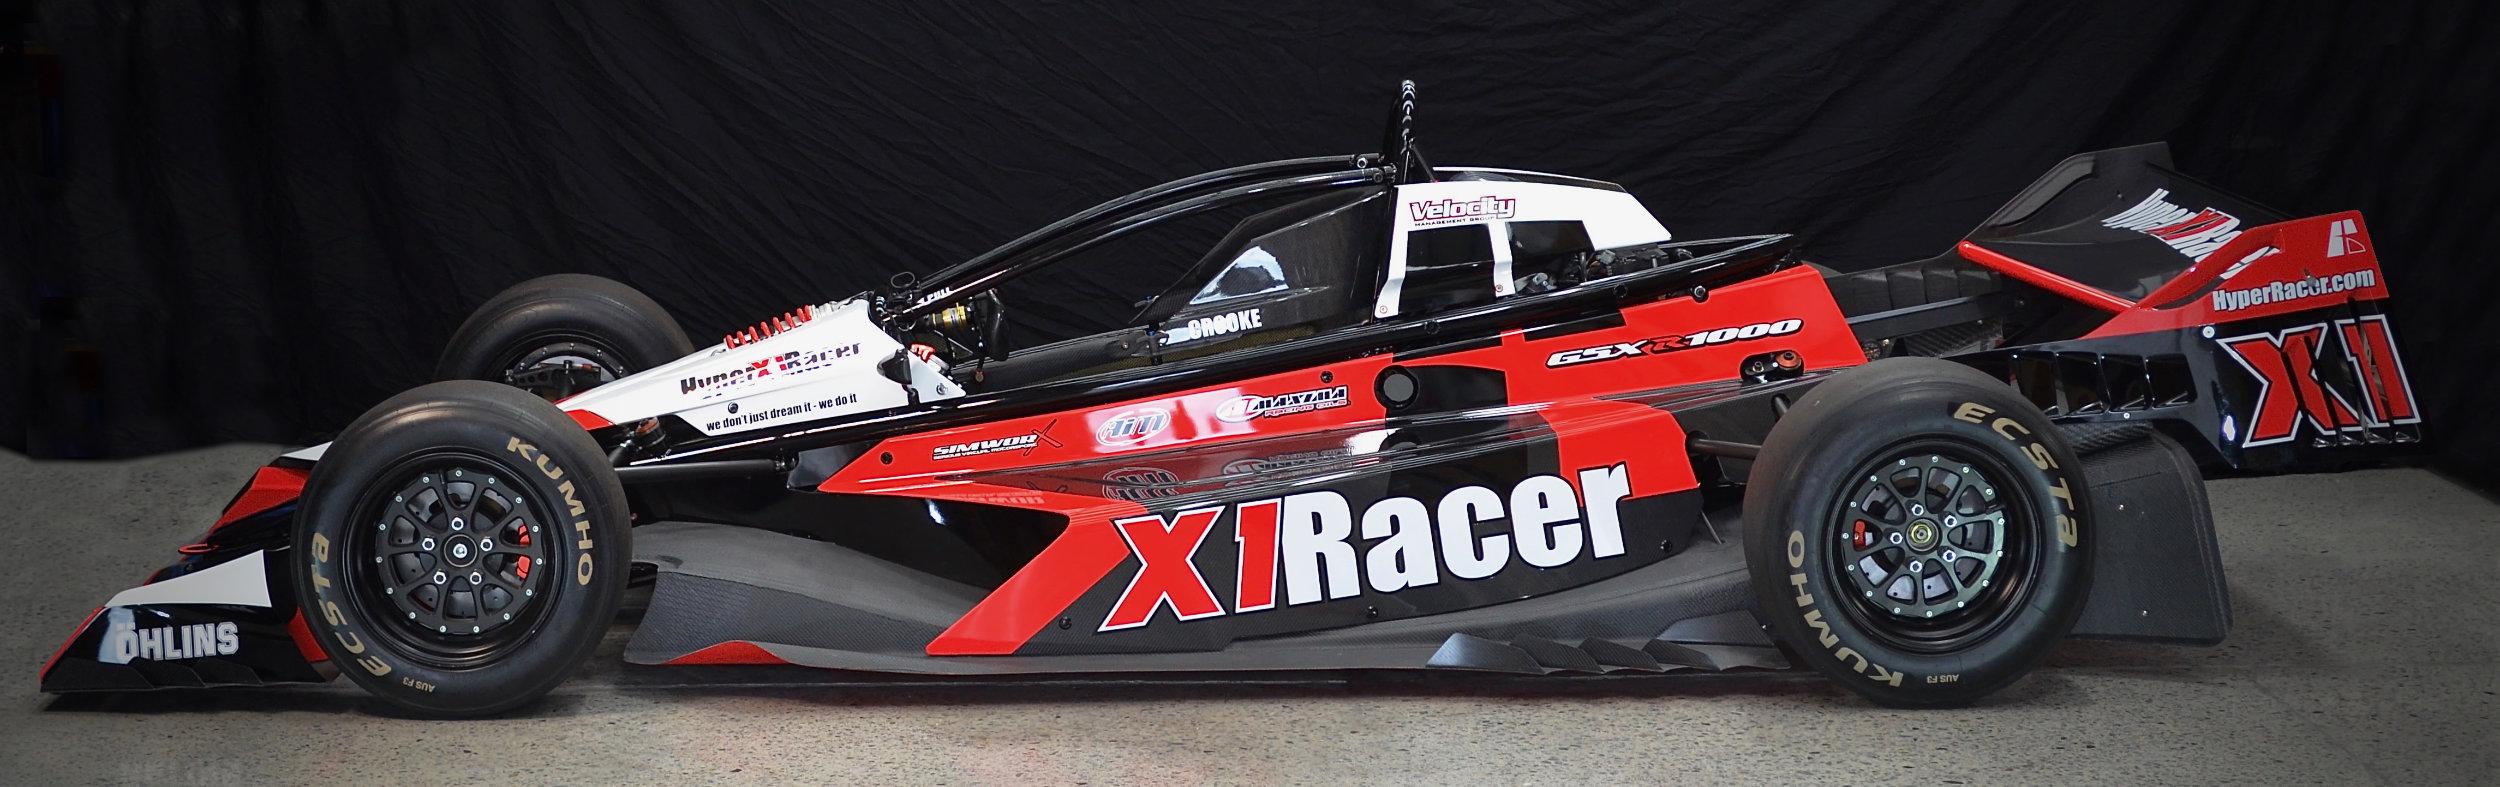 HyperX1Racer side s